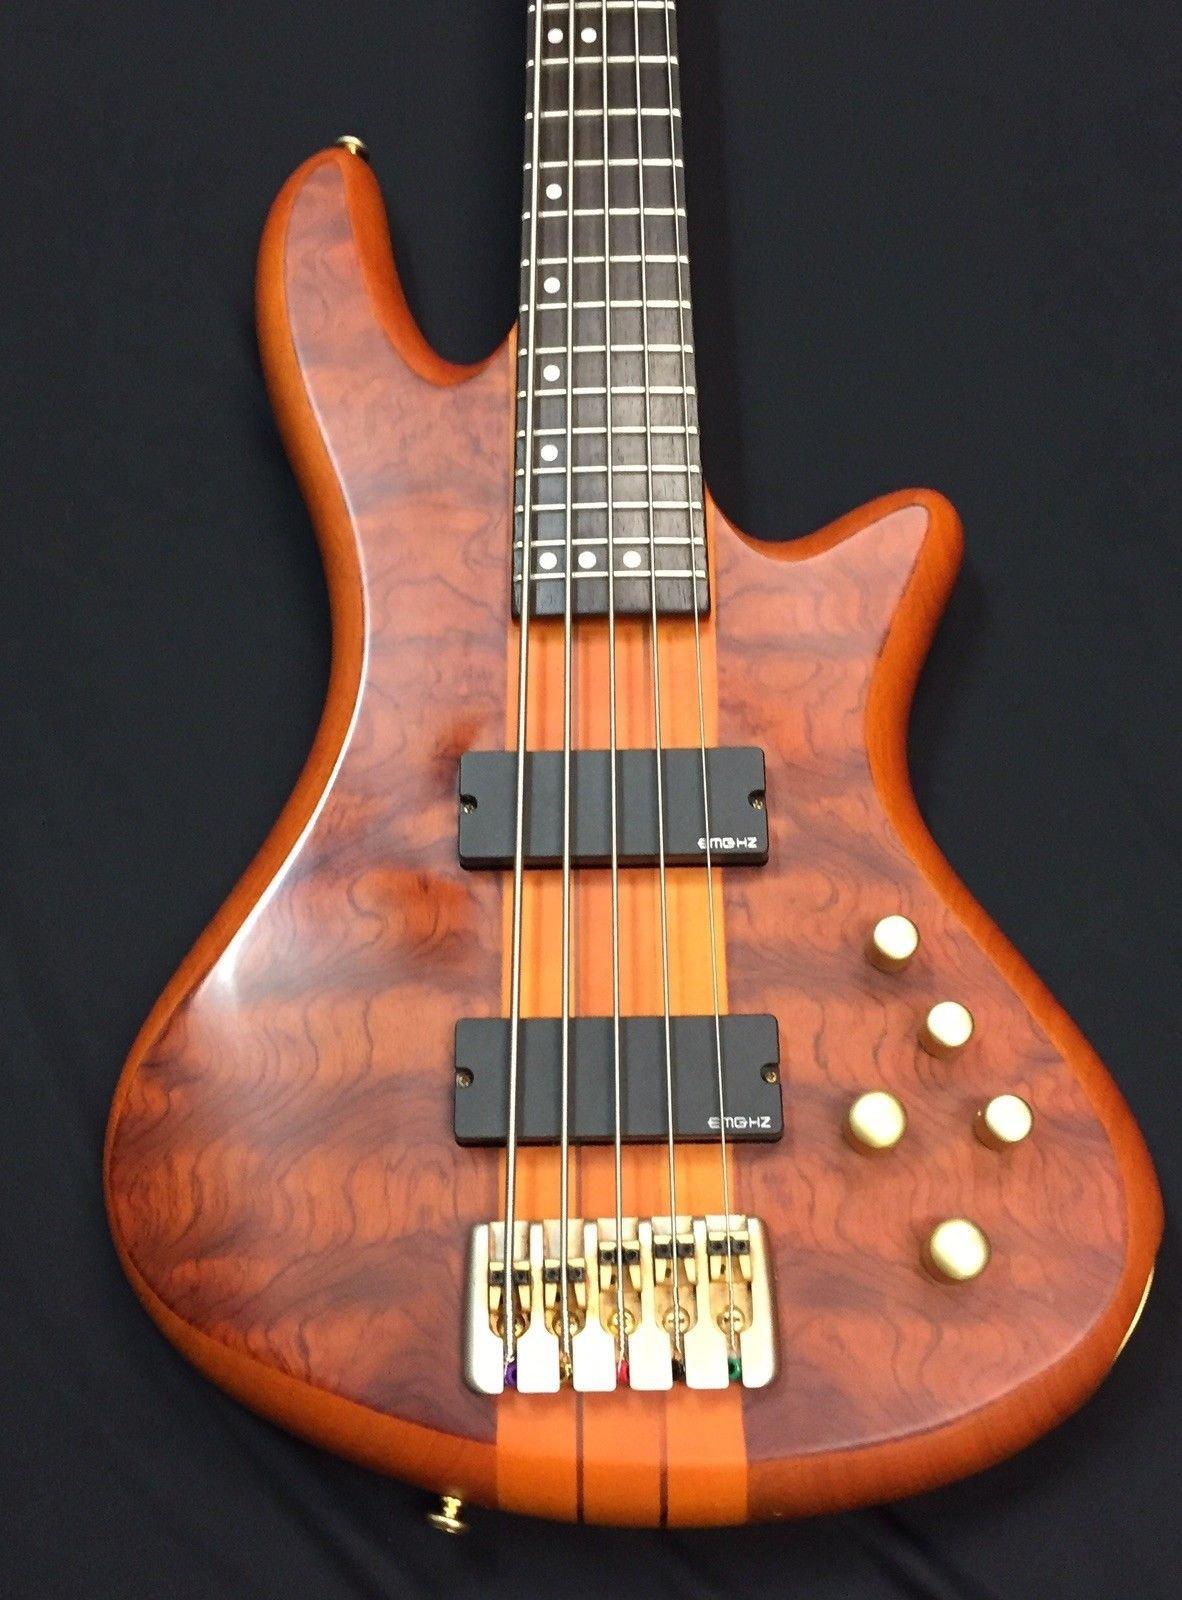 Used Schecter Daimond Sereis Stilleto Studio 5 Bass - Honey Satin